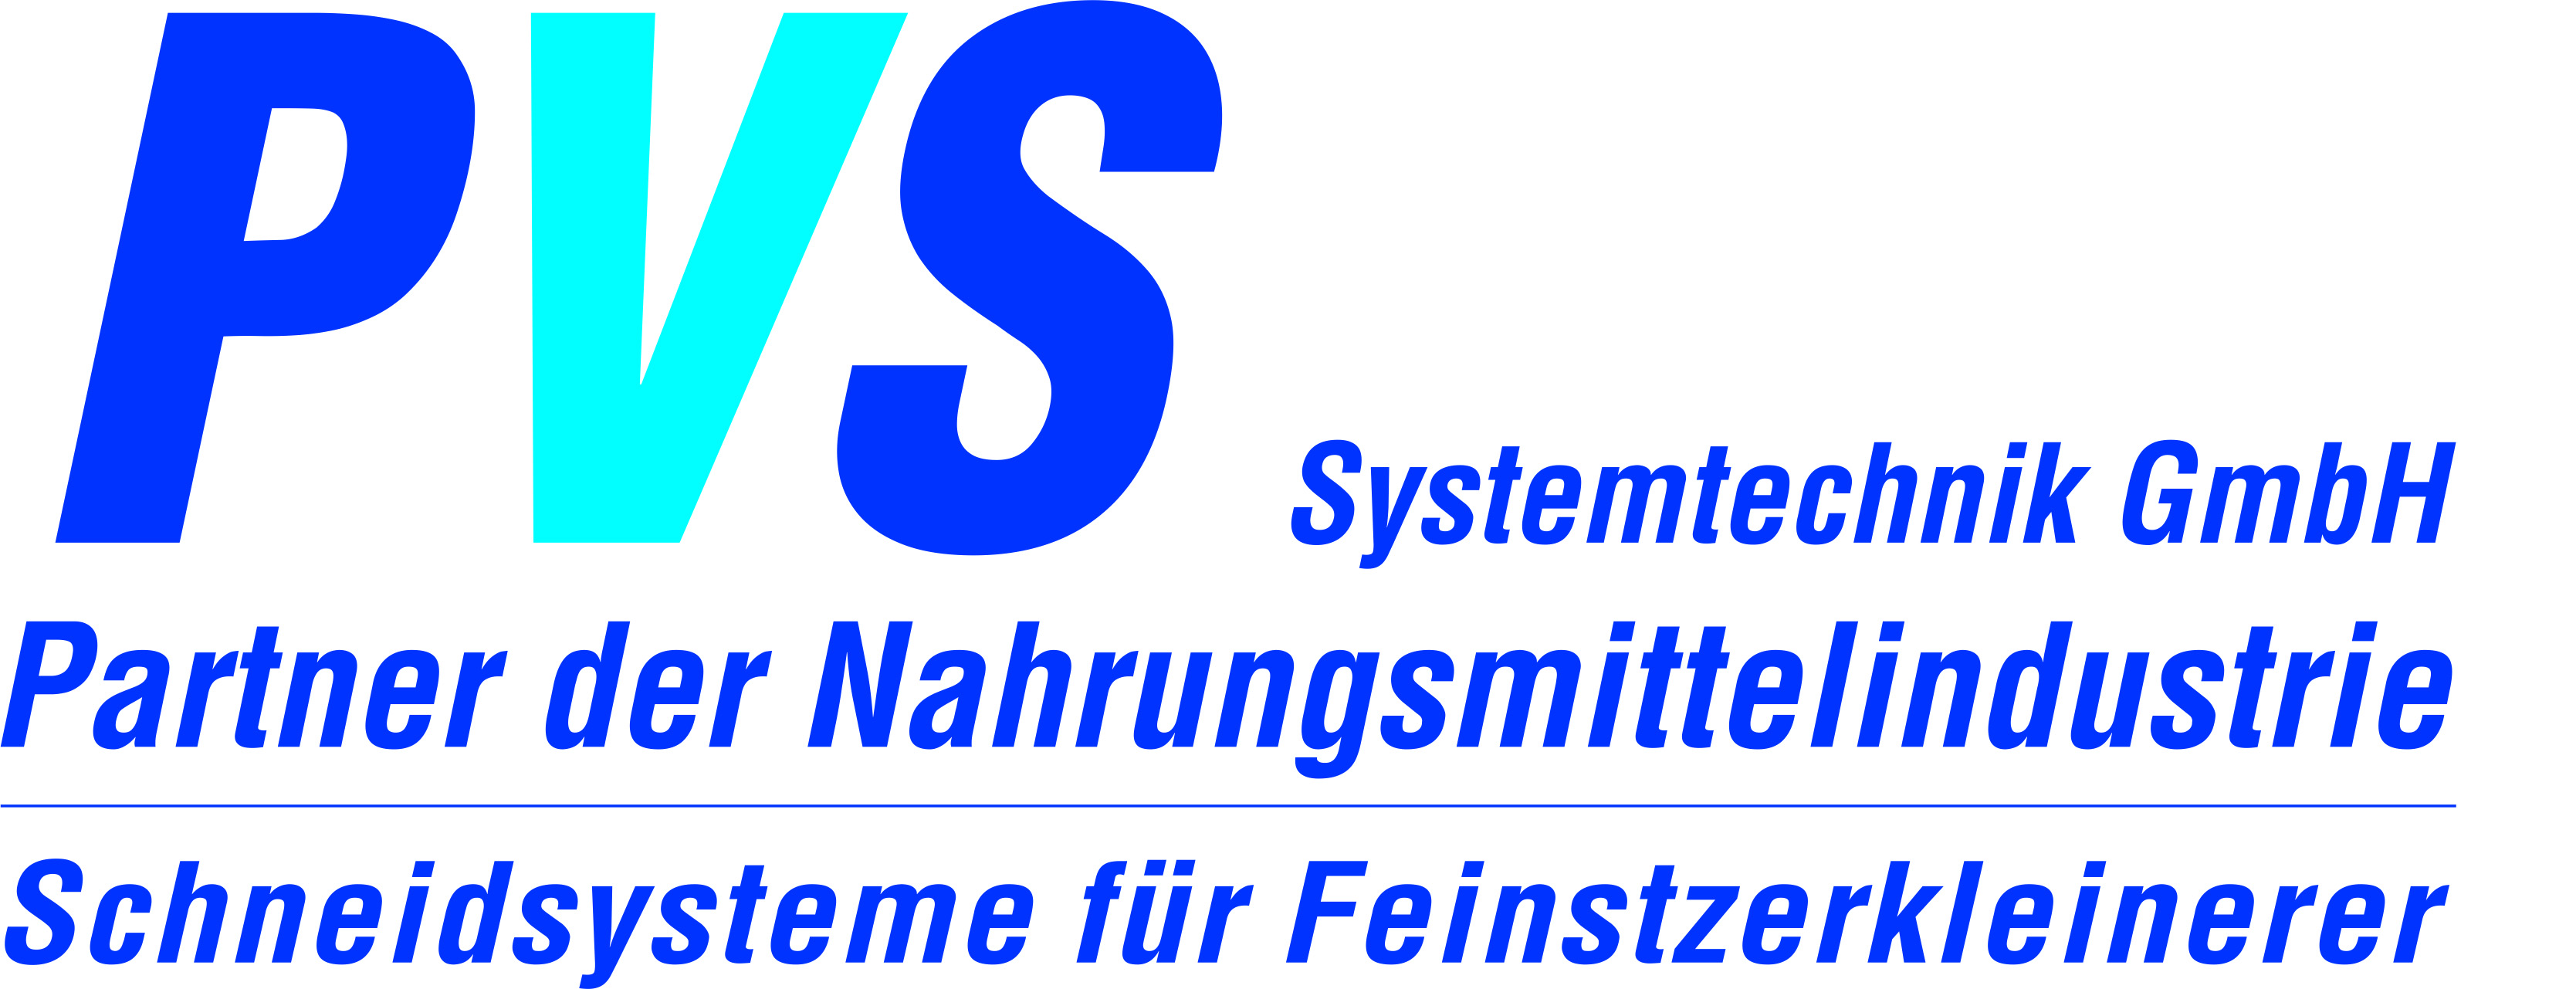 PVS Systemtechnik GmbH